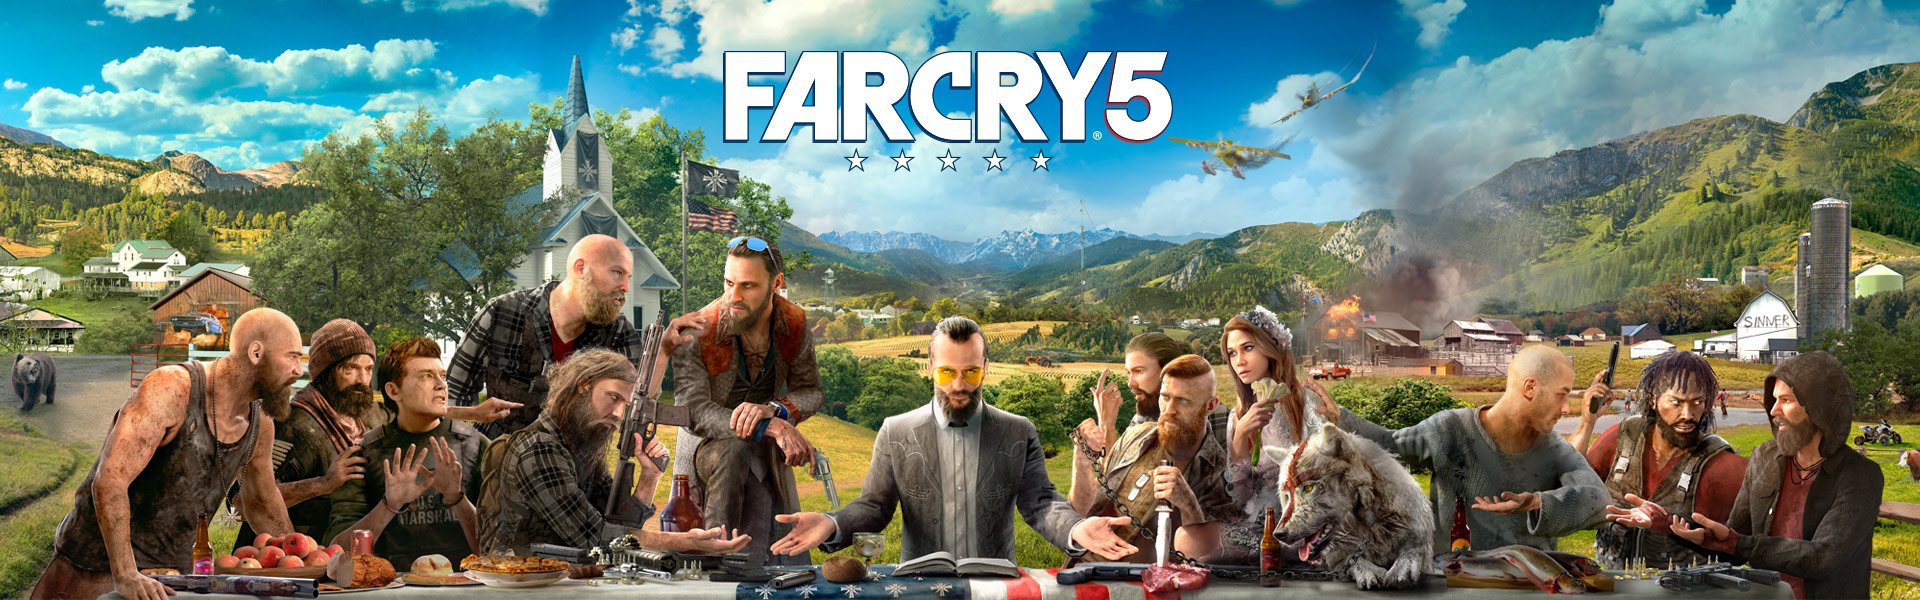 Top Selling Video Games